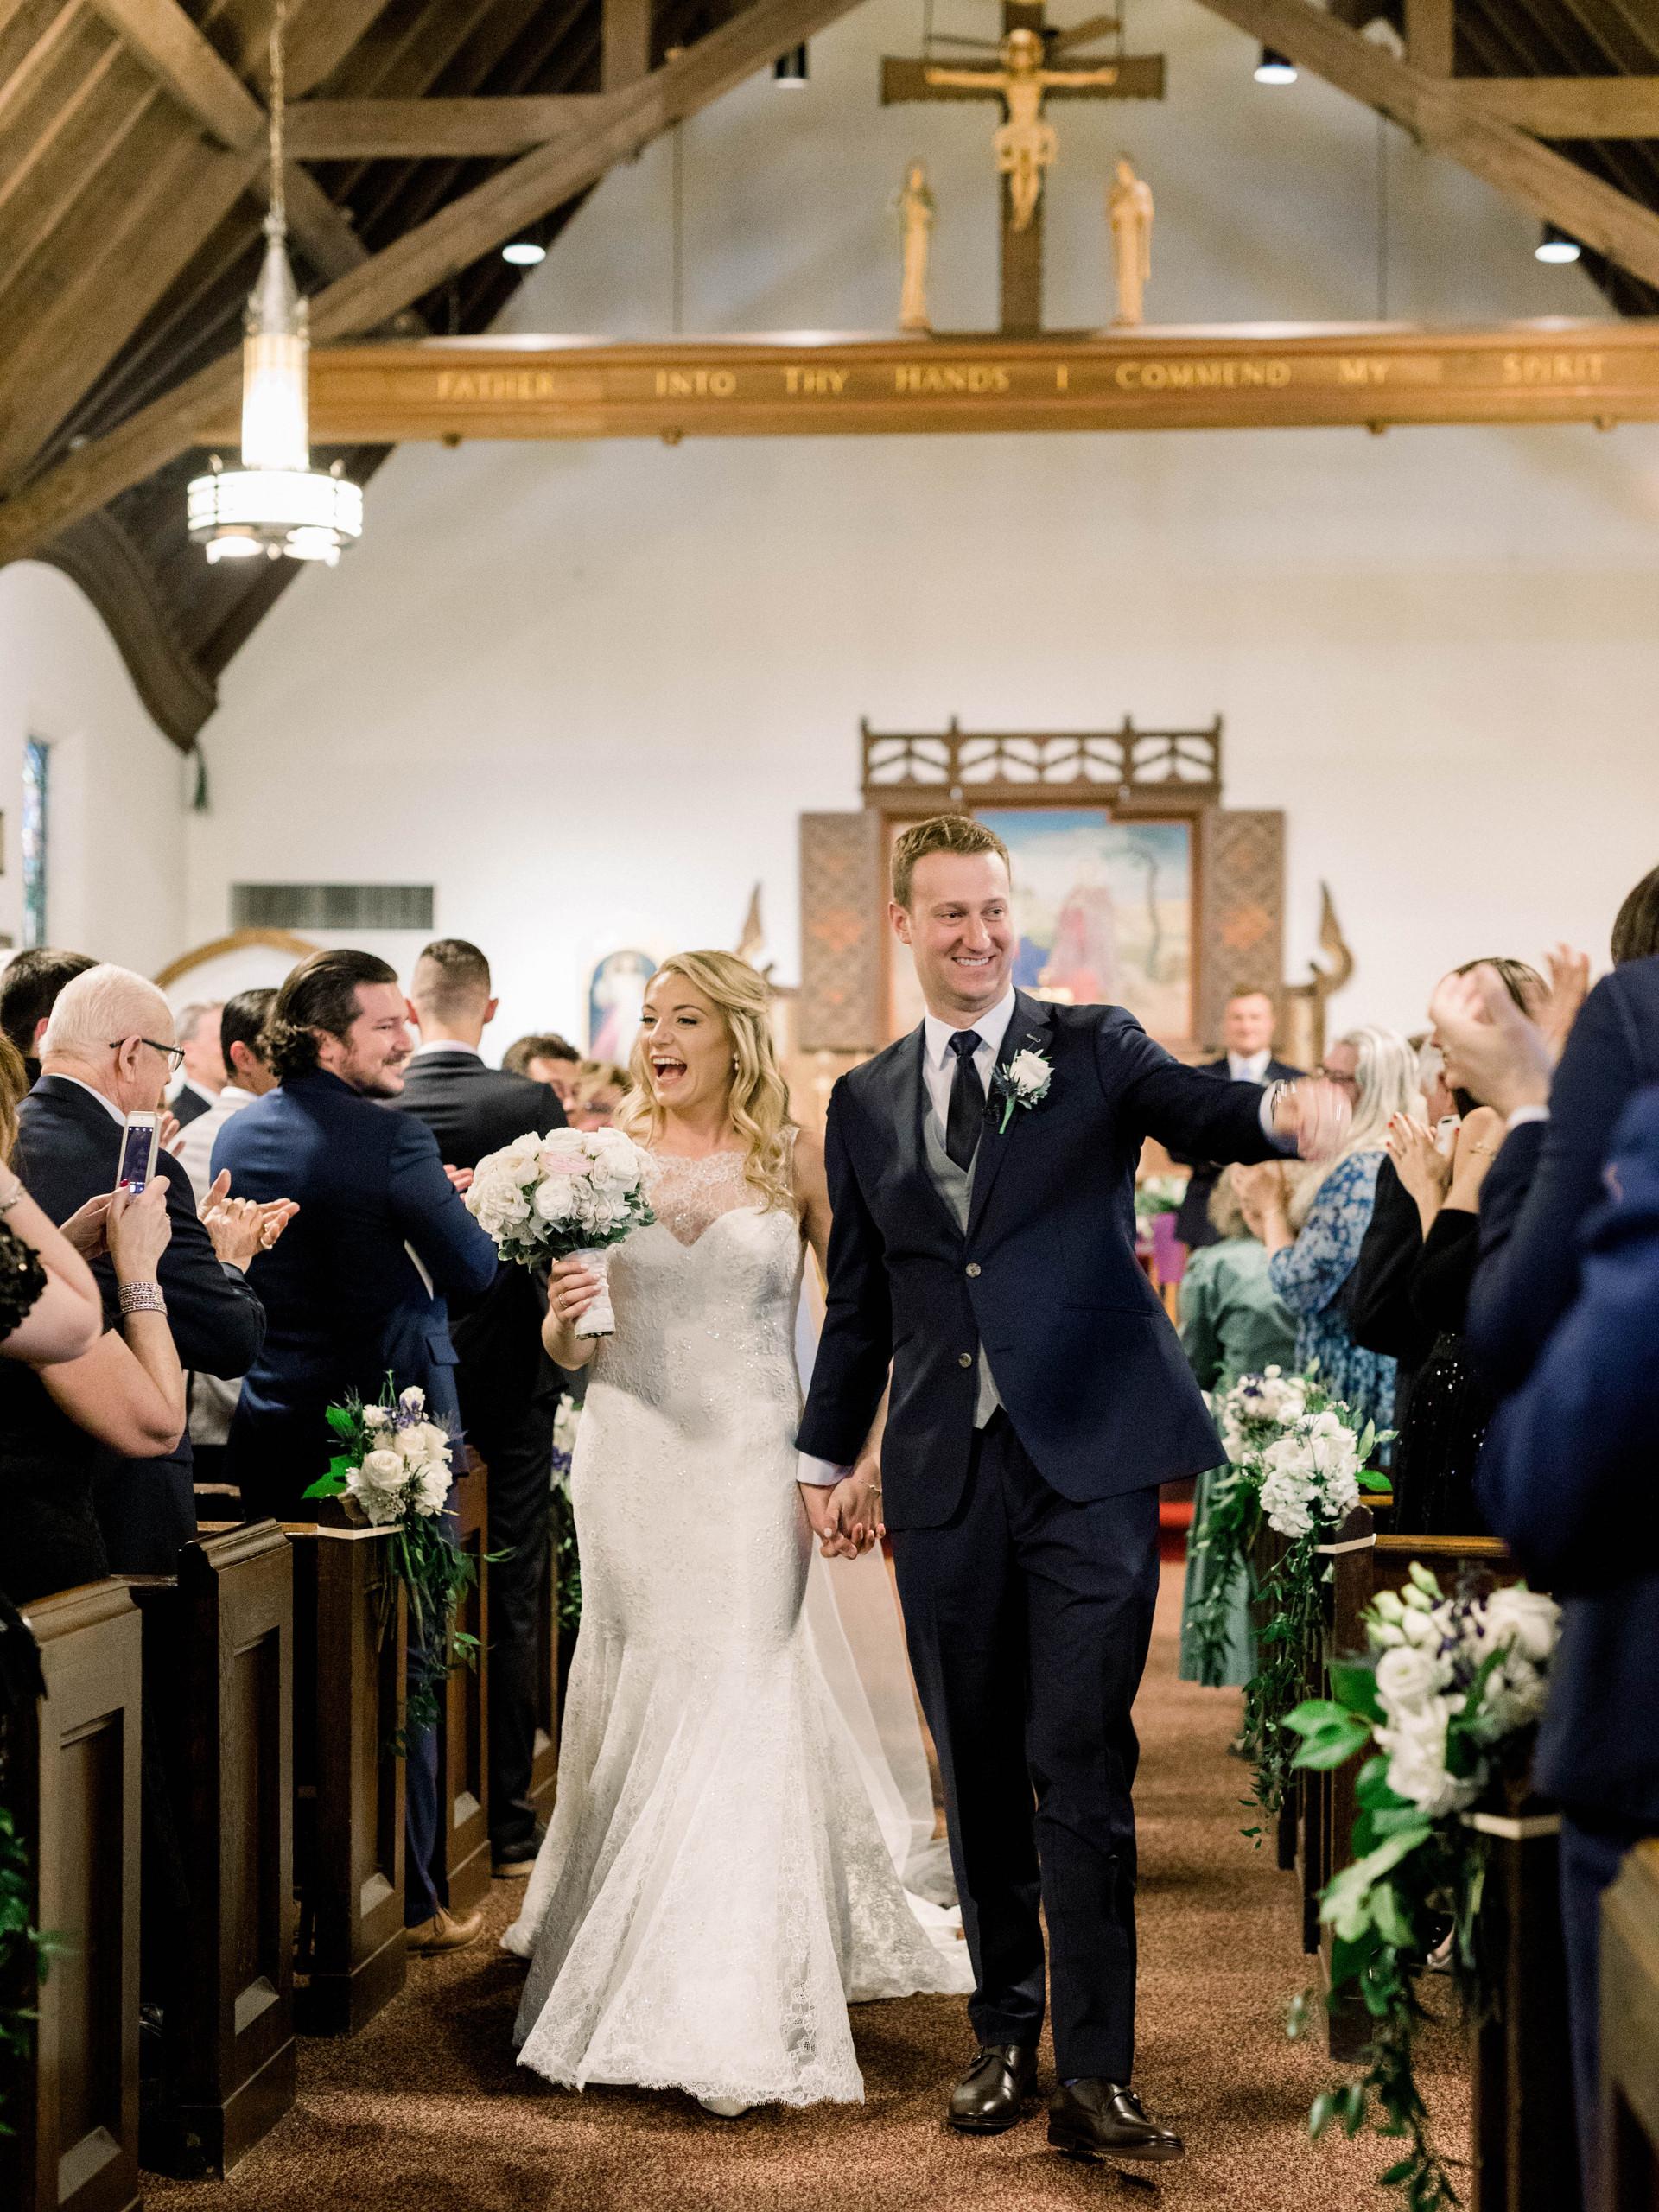 new-jersey-wedding-bride-groom-ceremony.